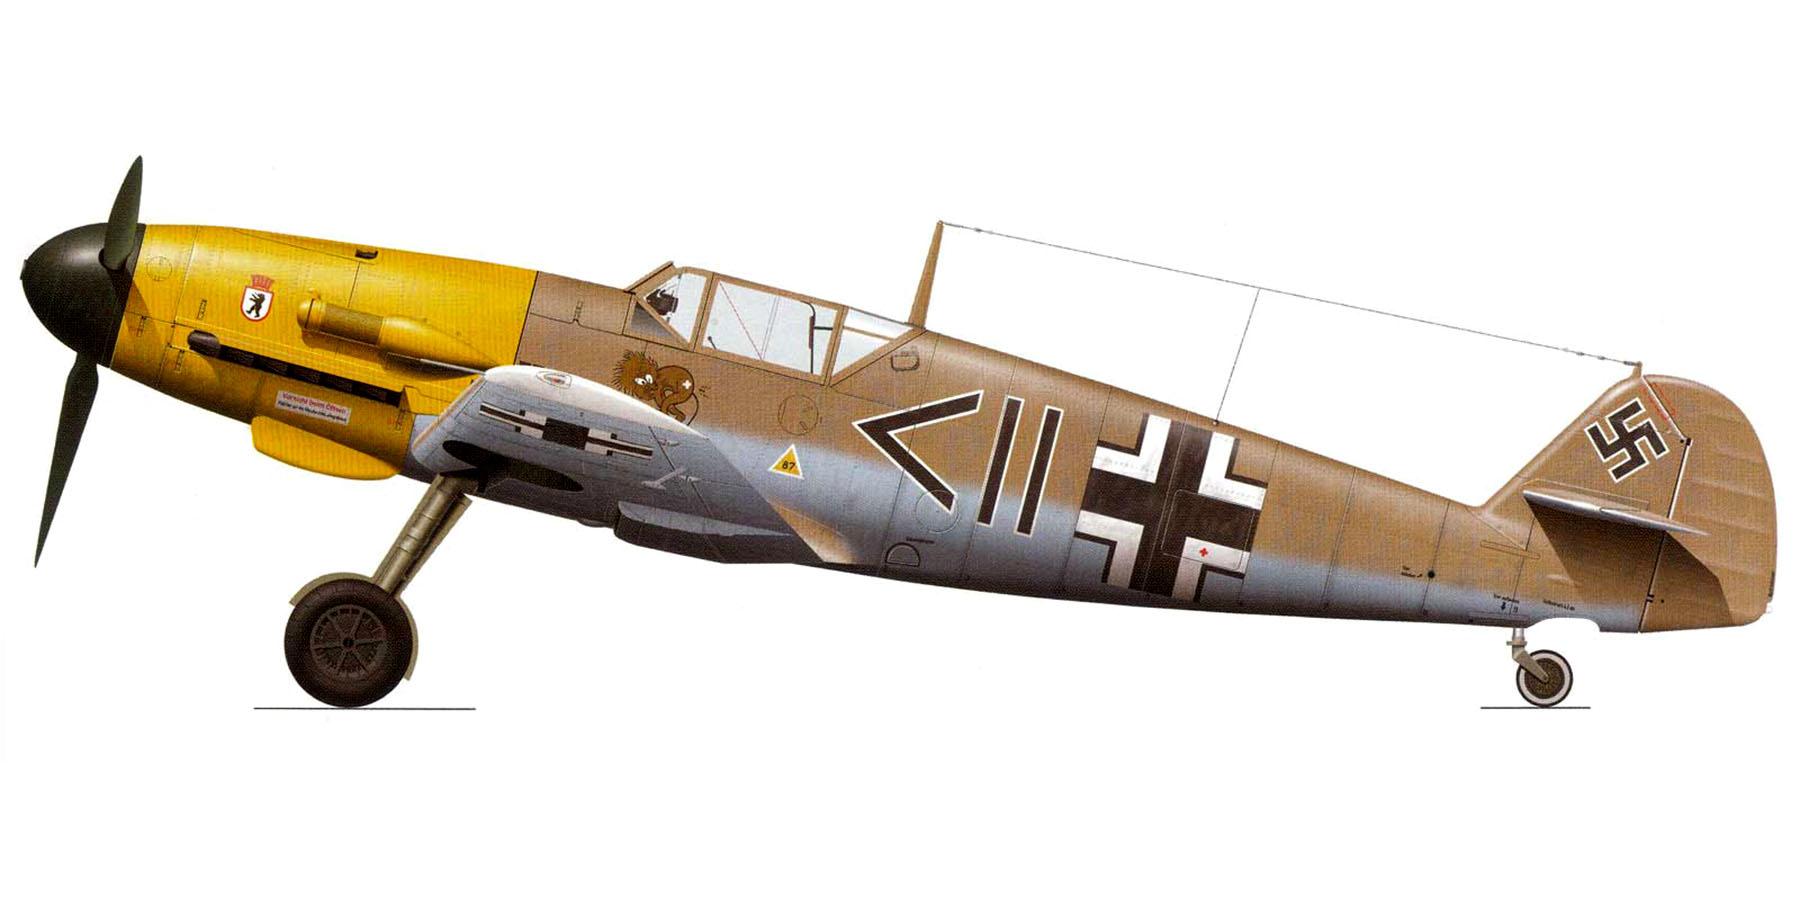 Messerschmitt Bf 109F4Trop Stab II.JG27 Otto Schulz WNr 10271 El Gazala 1942 0A